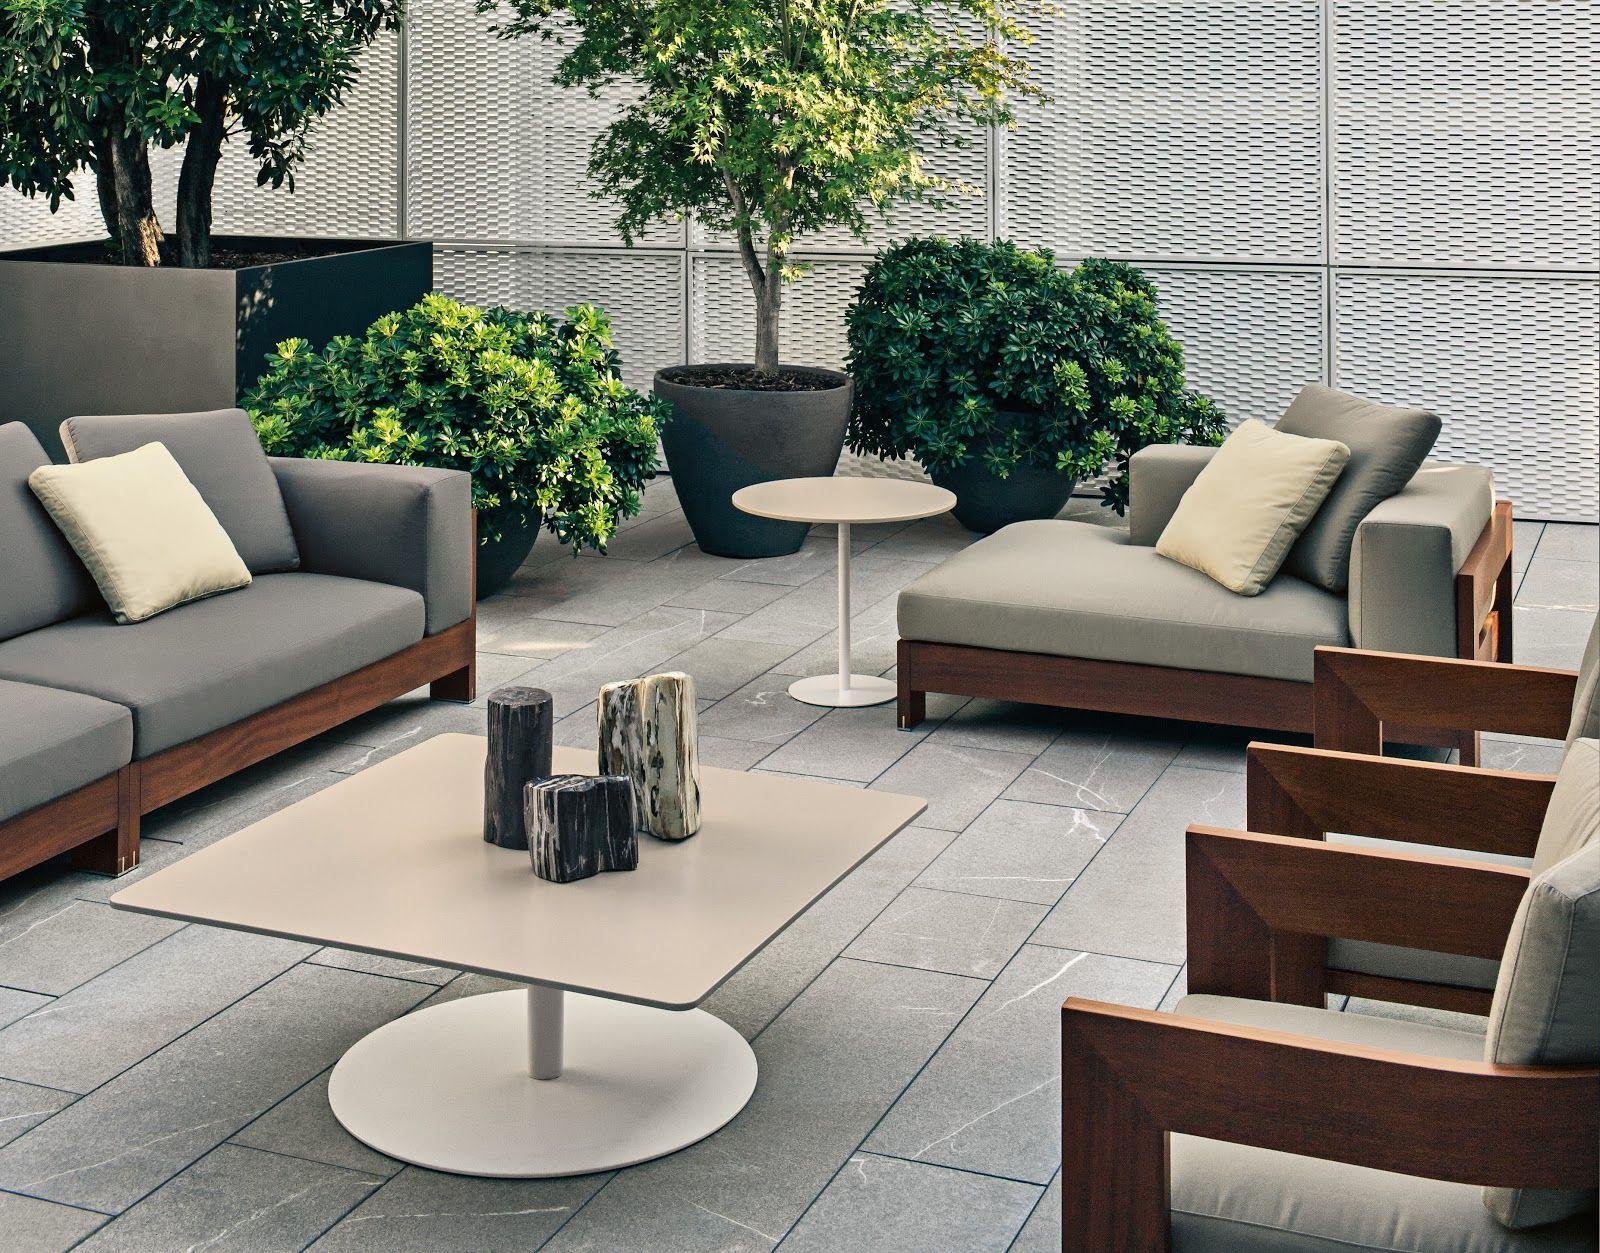 minotti lifescapes m bel pinterest garten terrasse m bel und terrasse. Black Bedroom Furniture Sets. Home Design Ideas